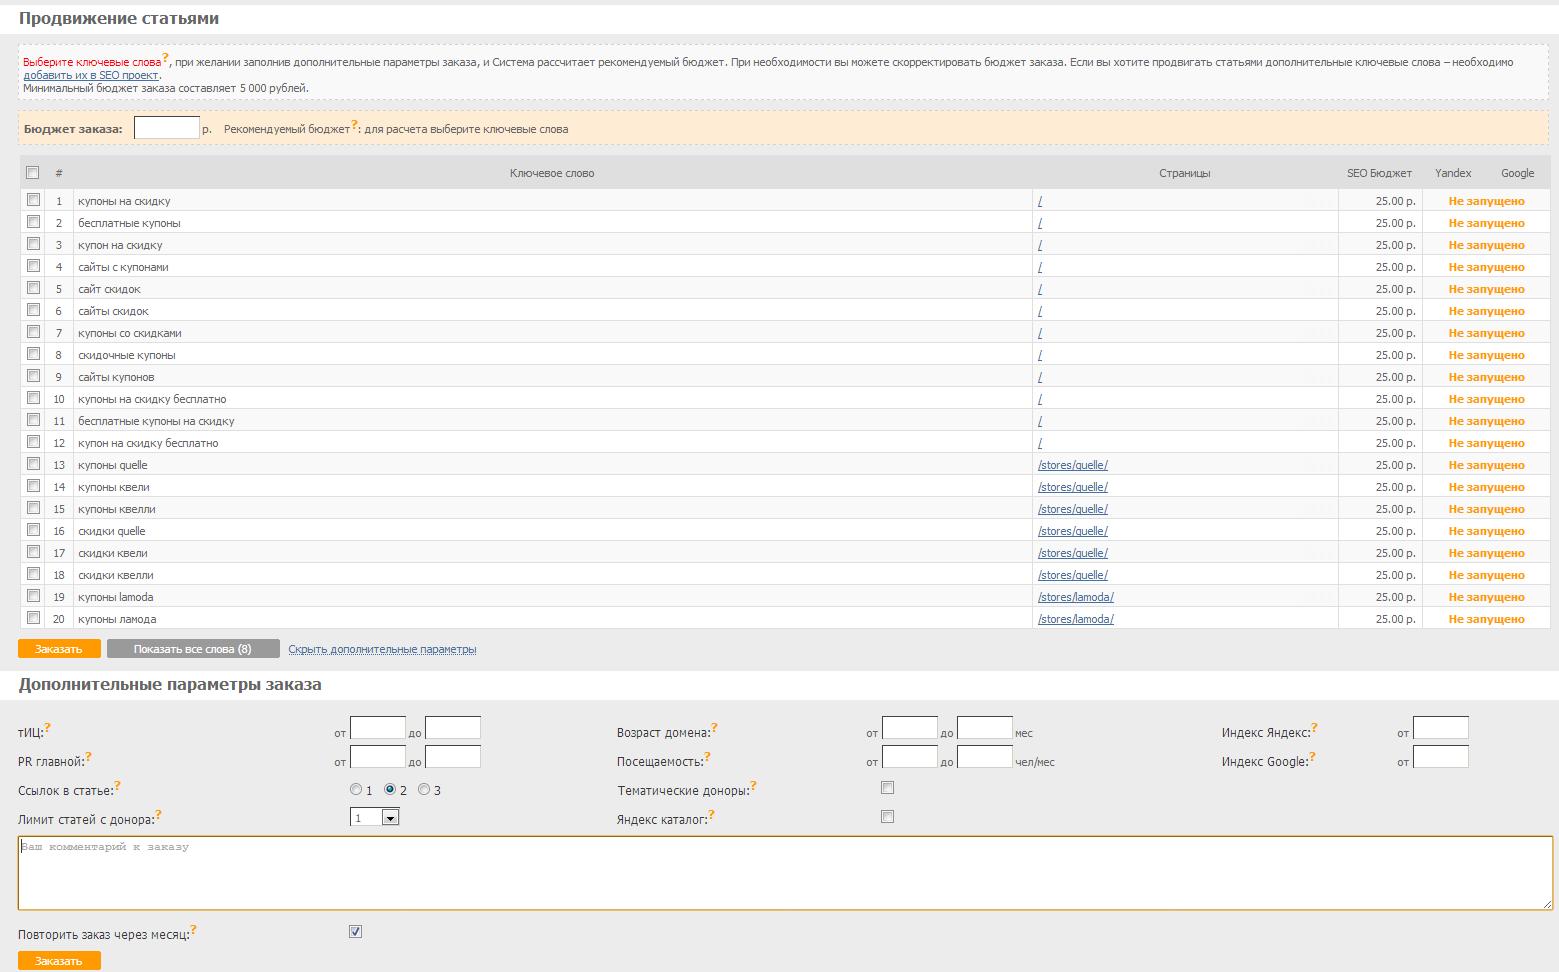 WebArtex очима оптимізатора — частина 2